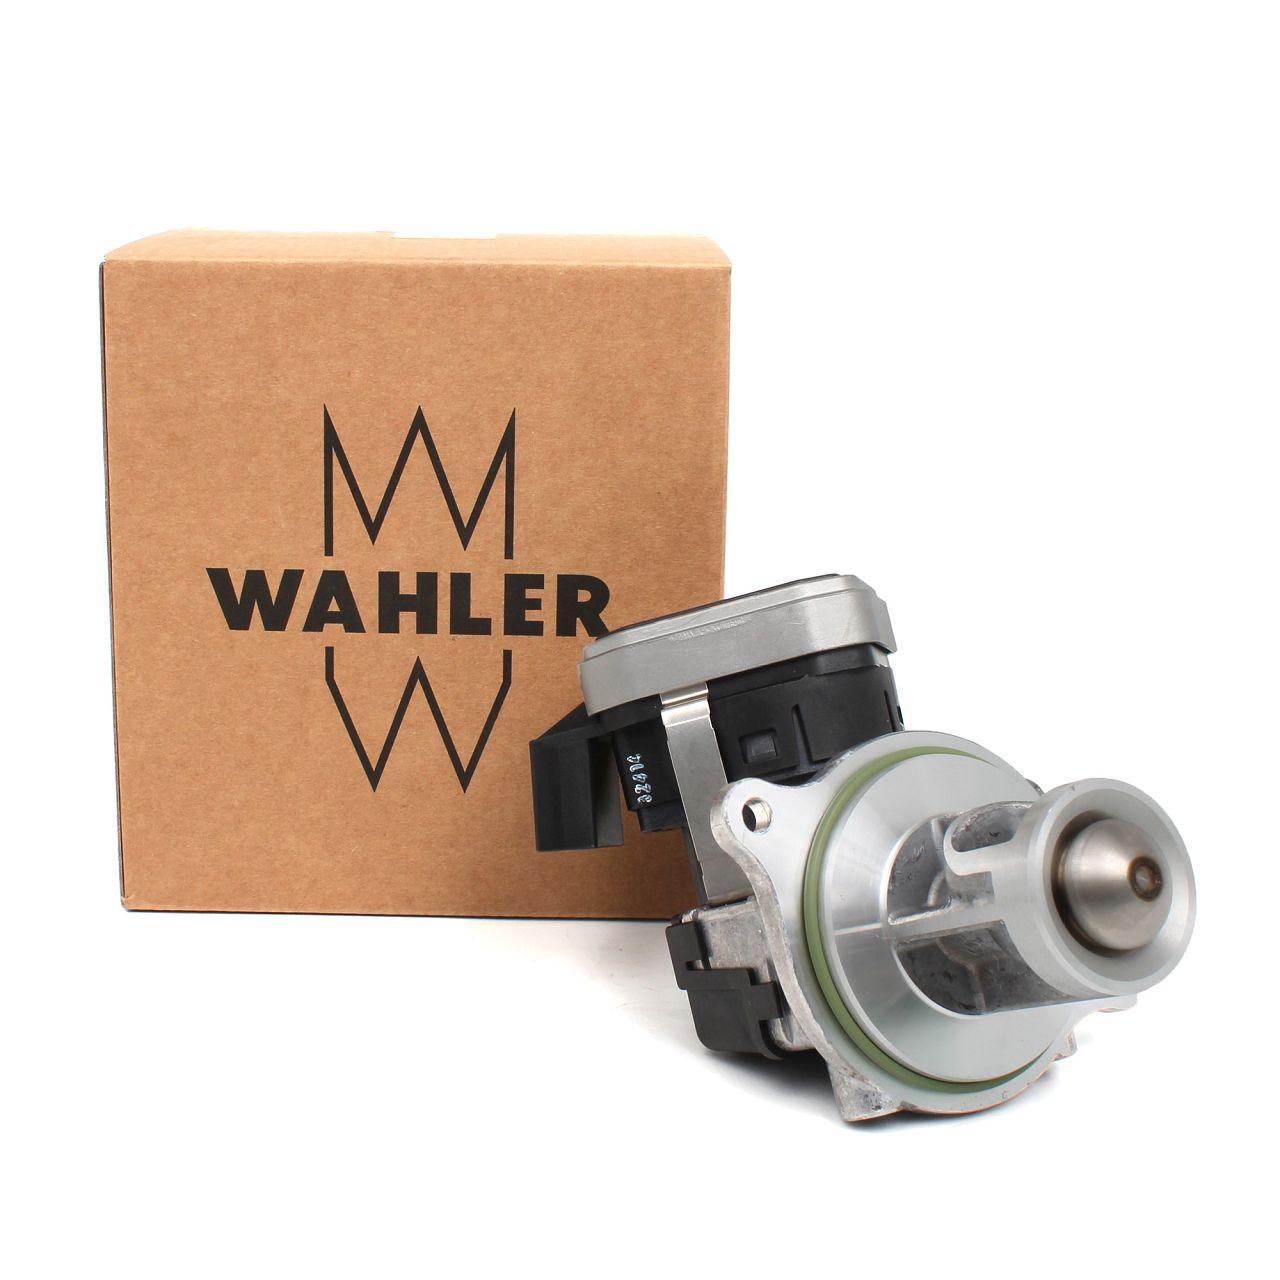 WAHLER AGR Ventil 710073D MERCEDES A-Klasse W169 B-Klasse W245 CDI 6401401960